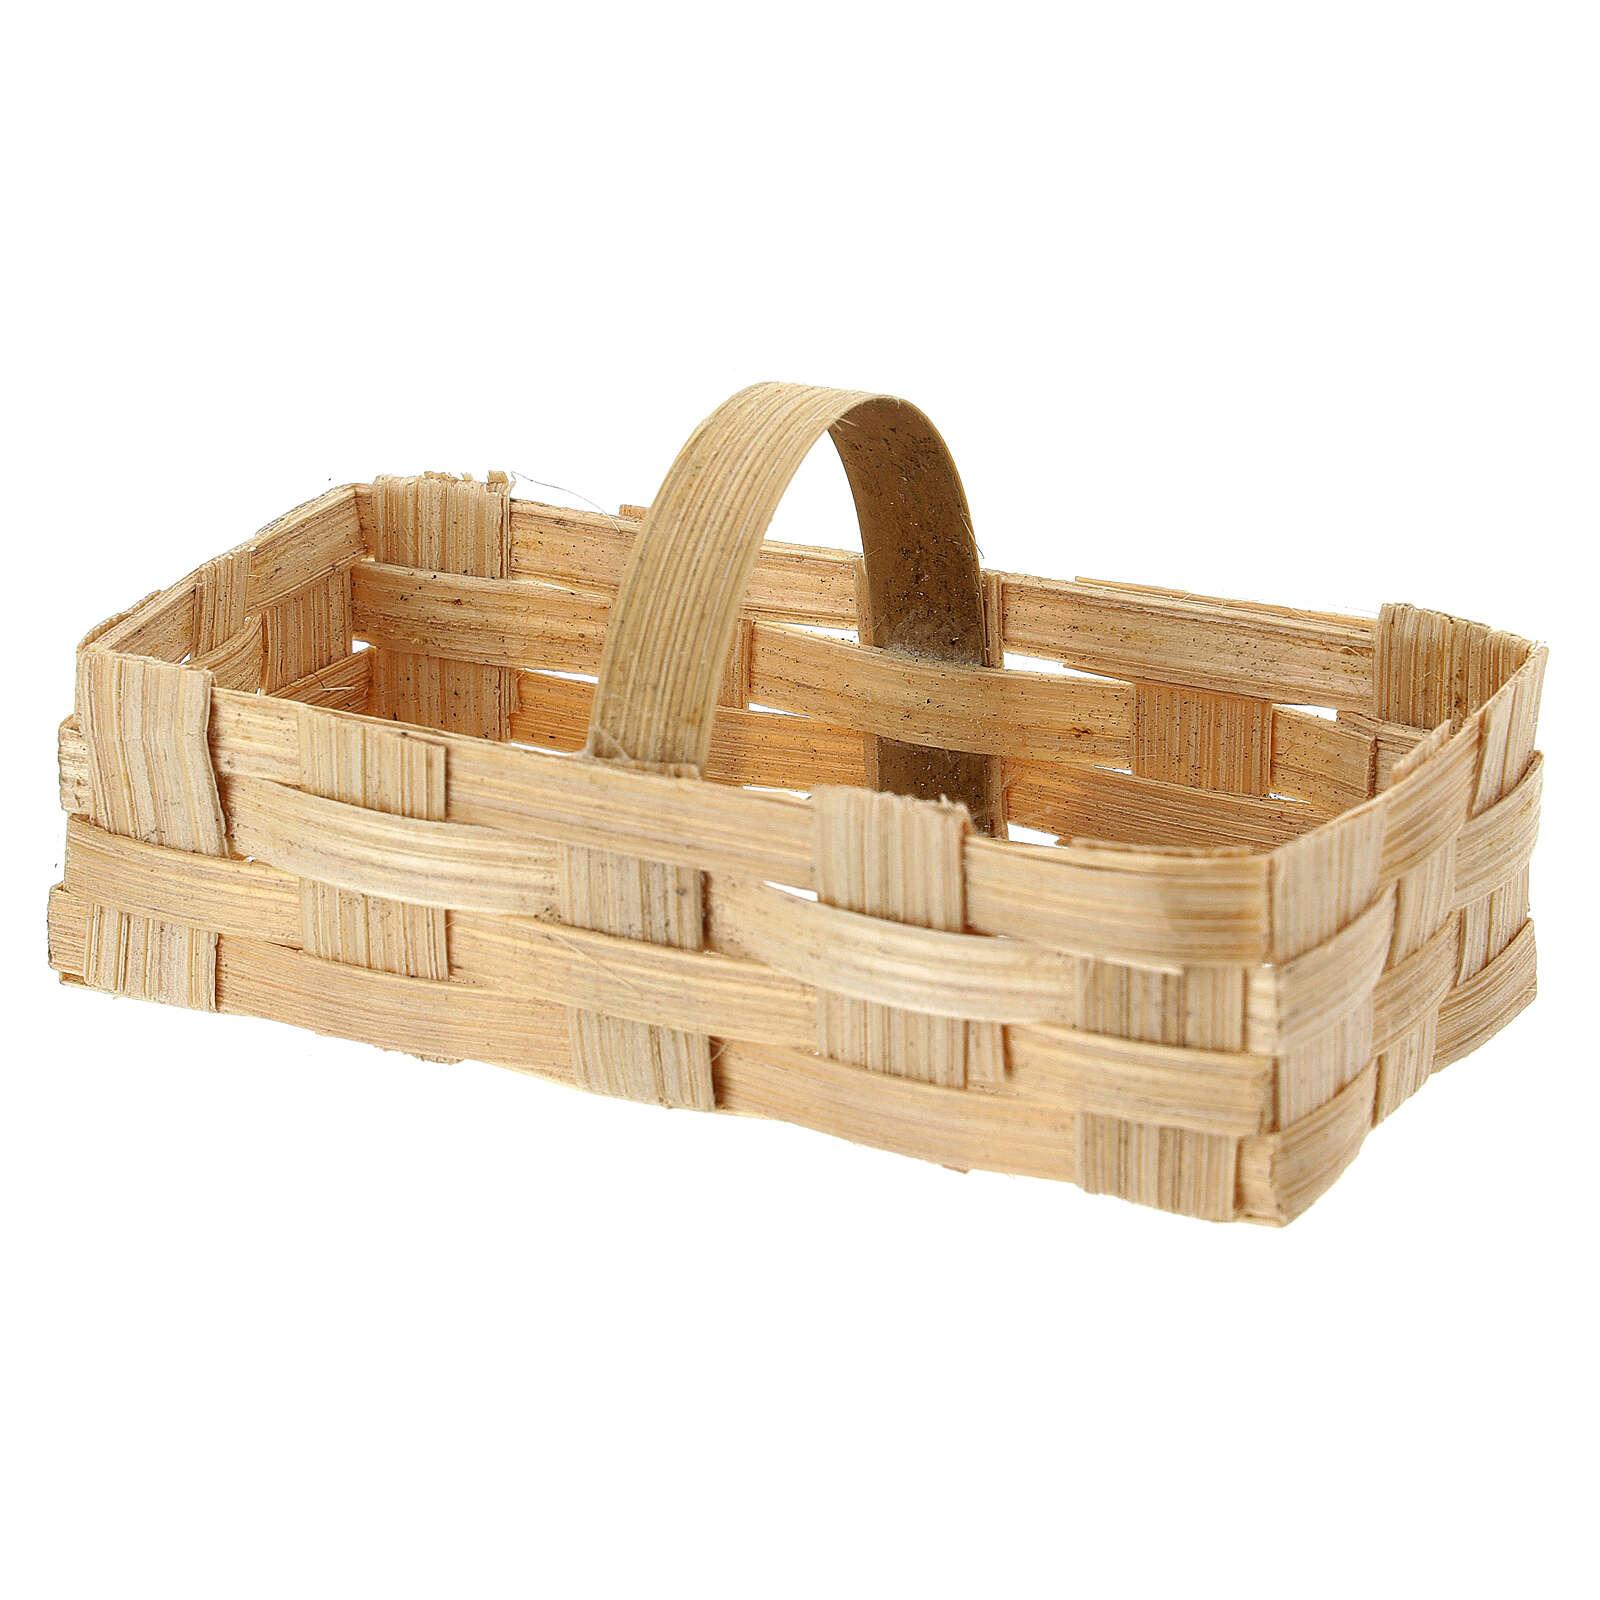 Rectangular basket 5x10x5 cm for Nativity Scene with 10-12 cm figurines 4